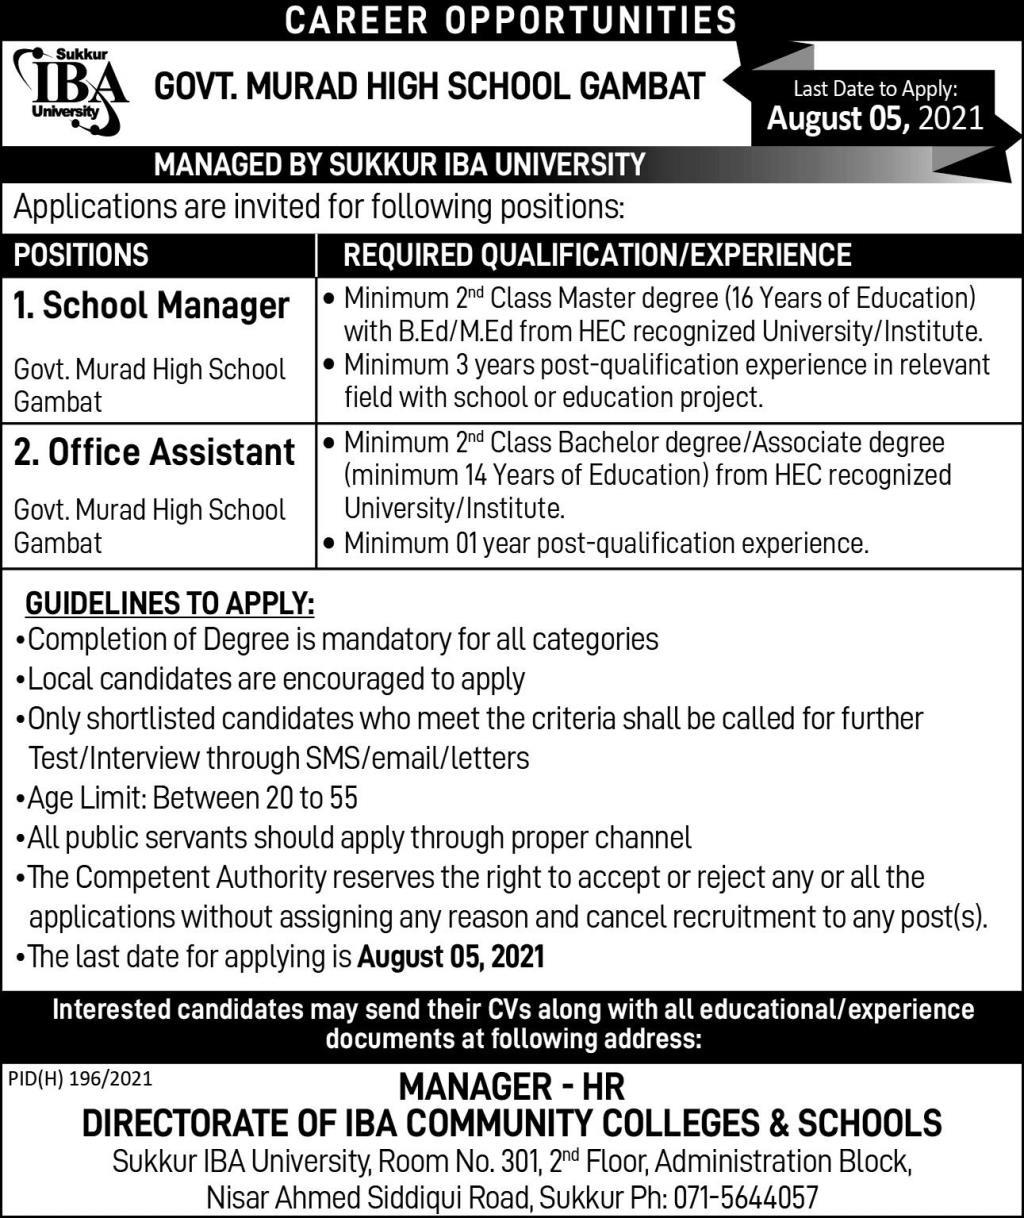 Sukkur IBA University Jobs 2021 - Govt. Murad High School Gambat Jobs